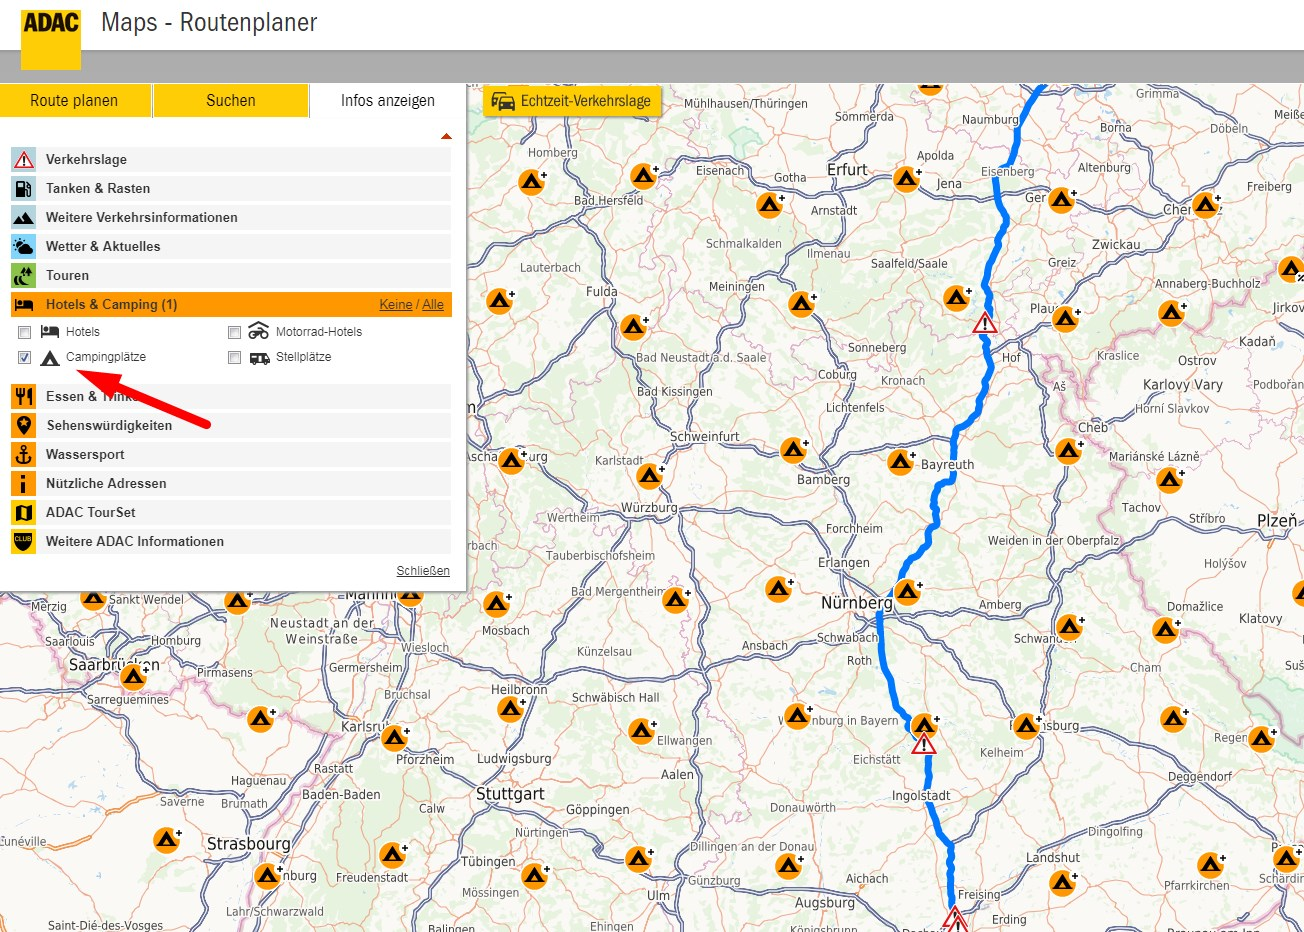 Camping Route planen - Routenplaner für Campingplätze